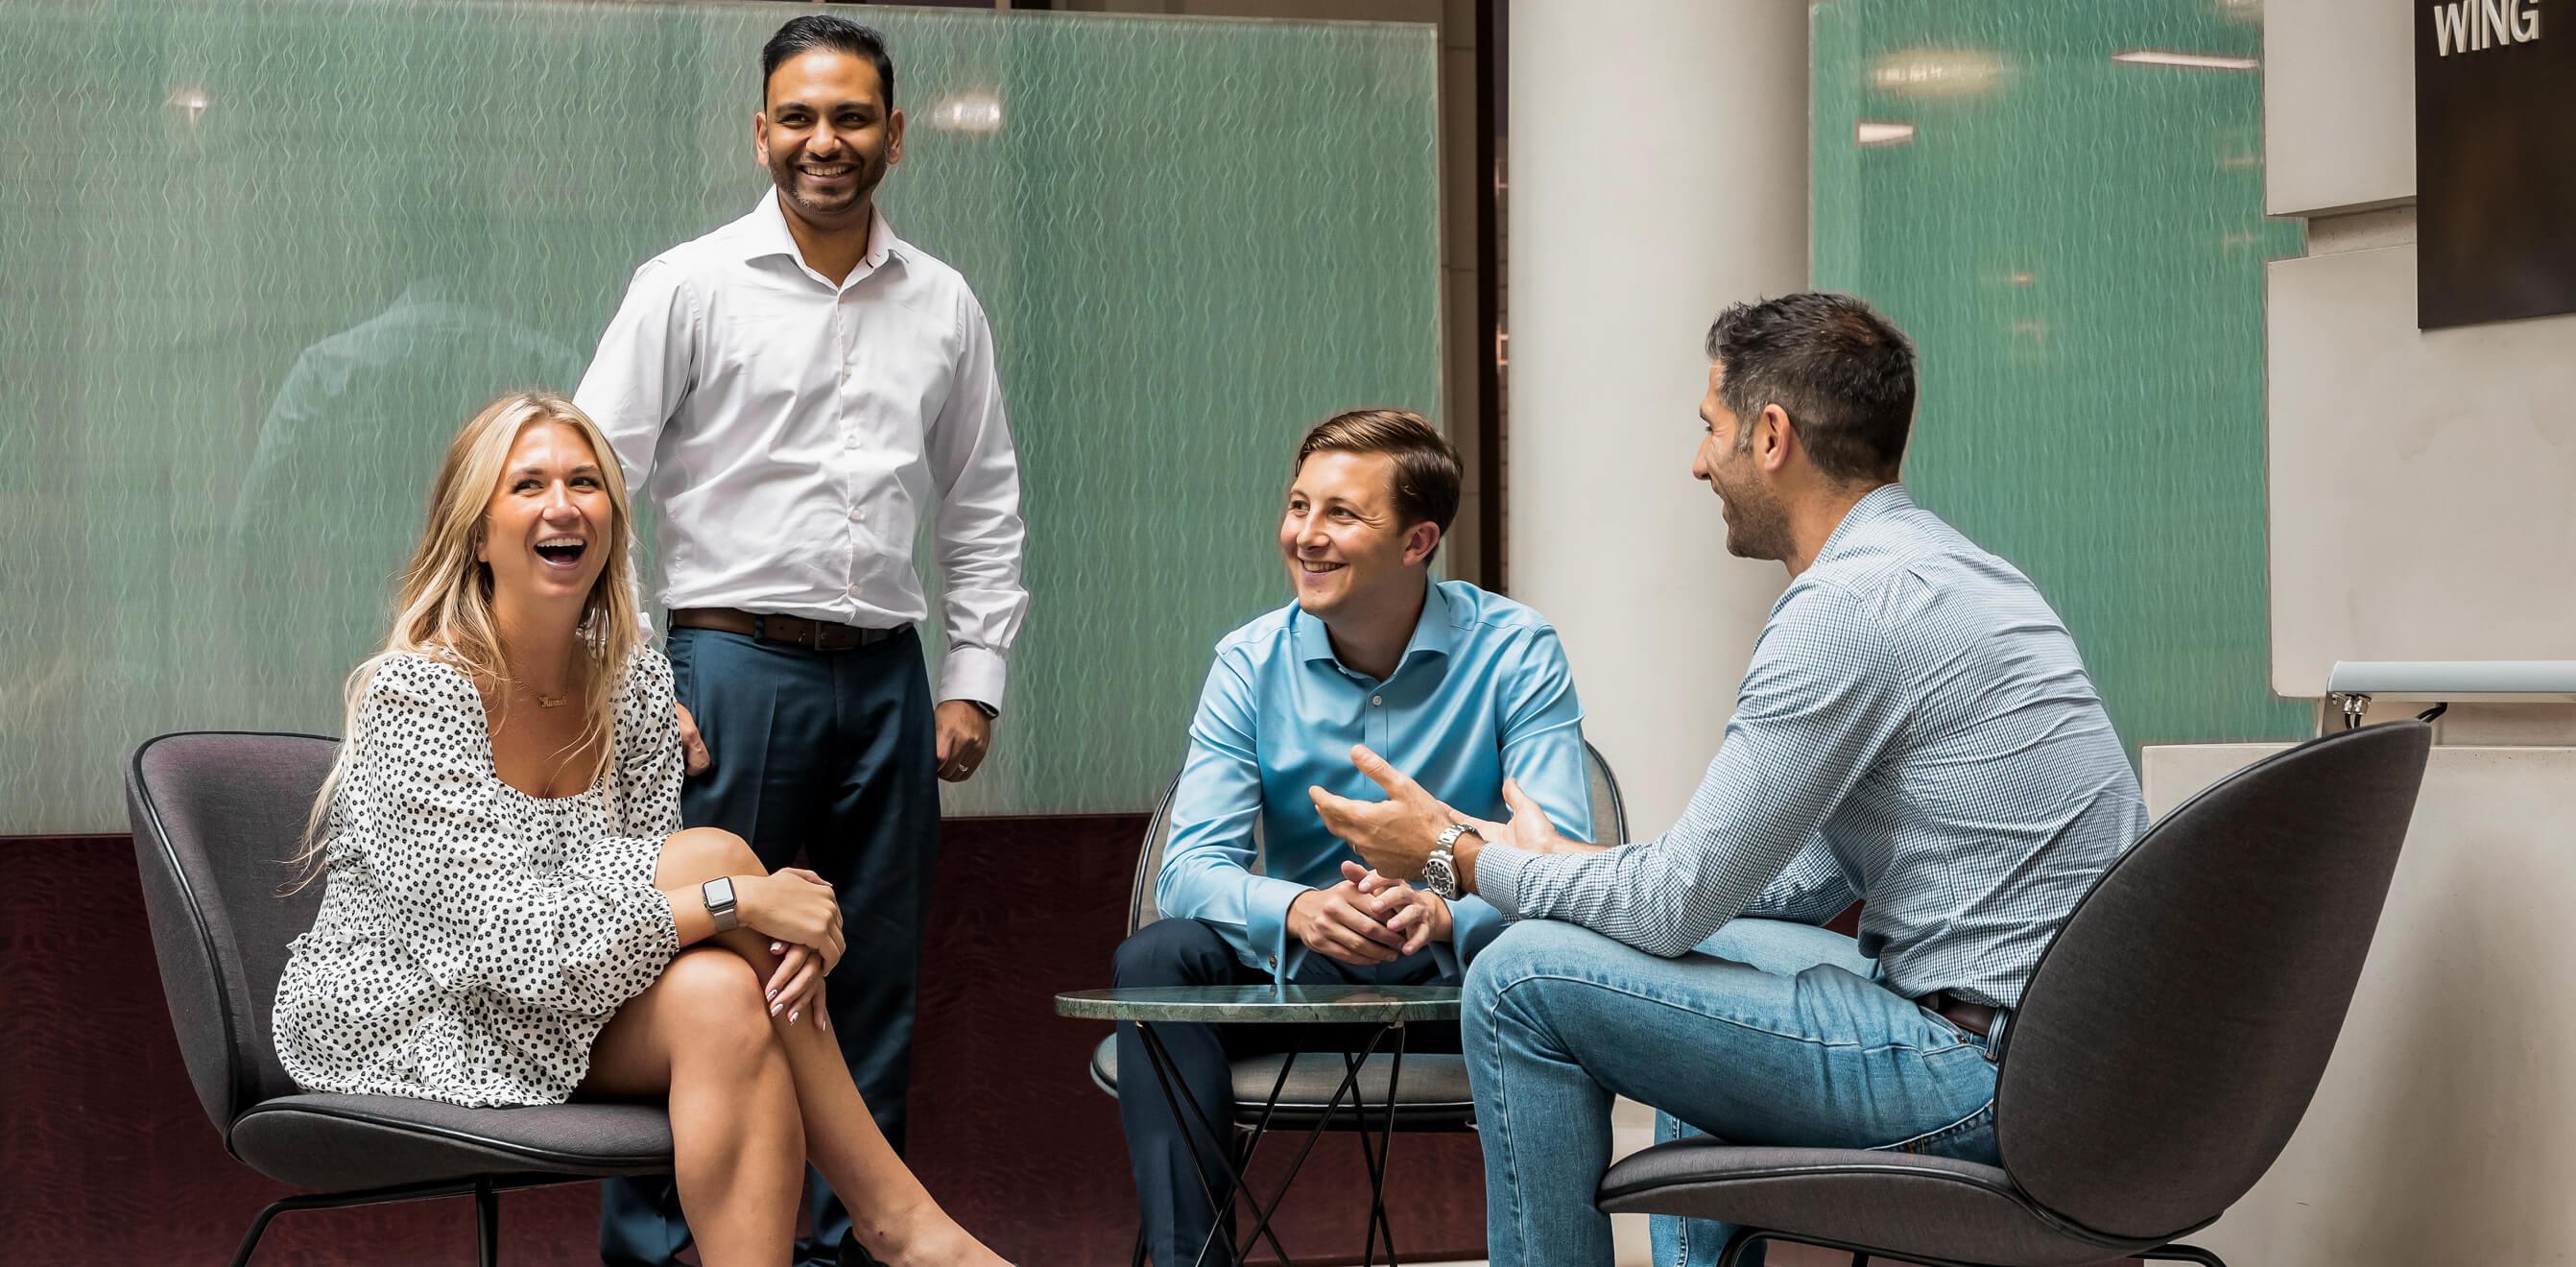 Equals Money: We make money management simple